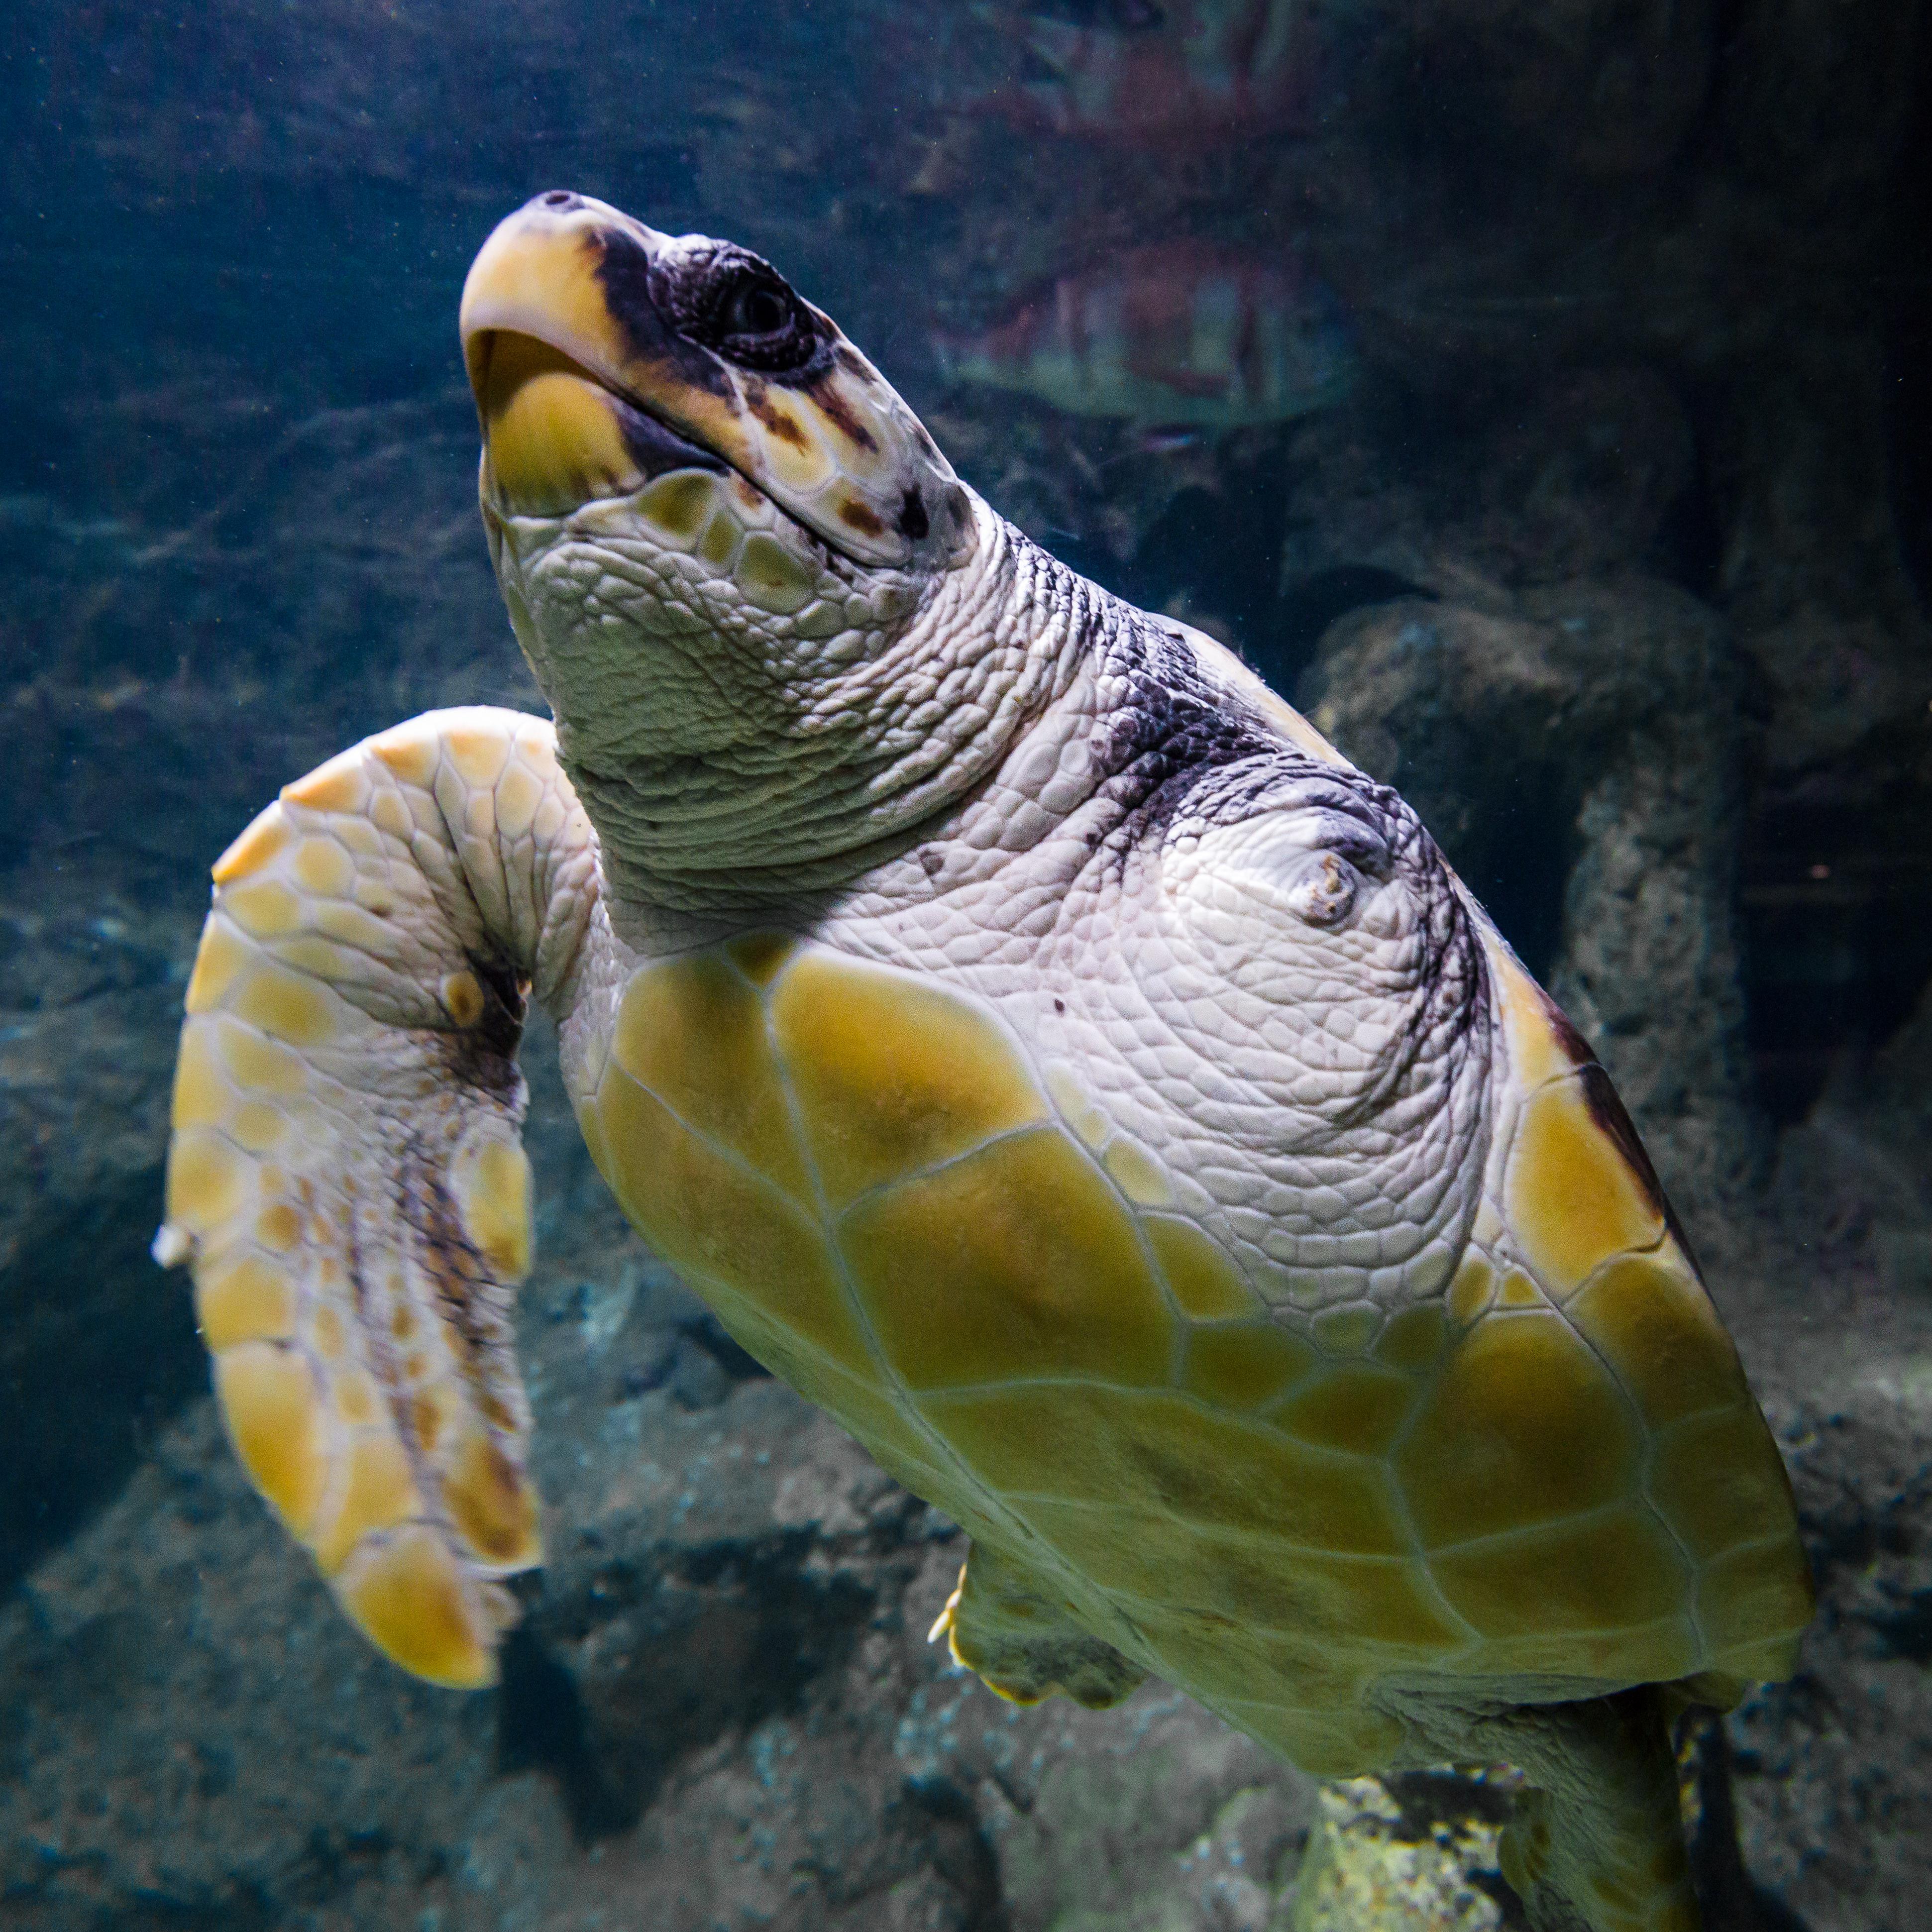 Image of Tickets for the Roquetas de Mar Aquarium